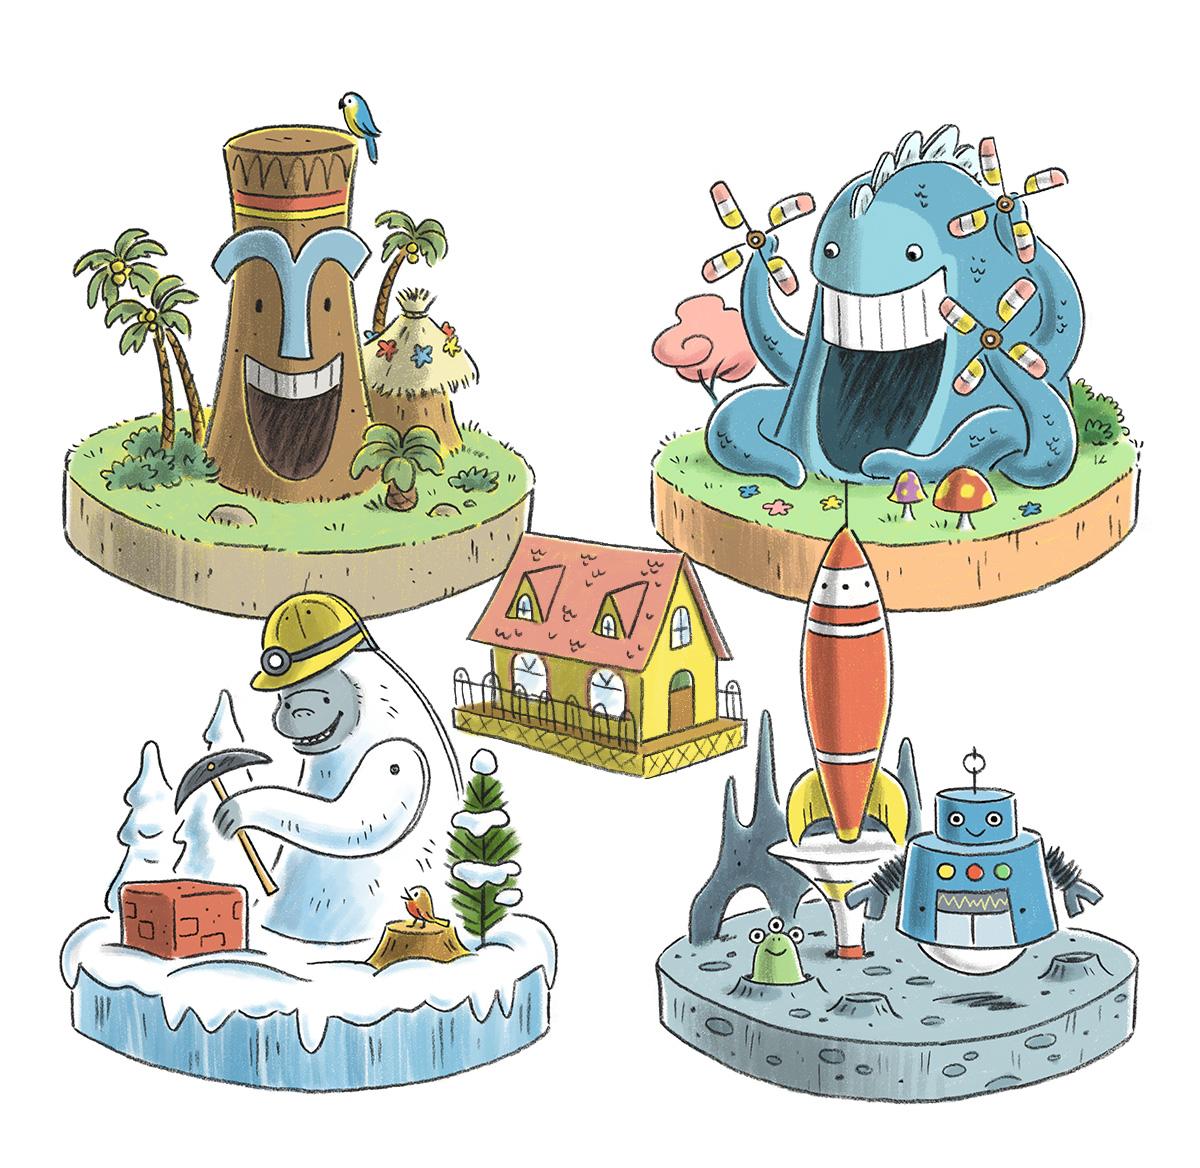 Final art / Curious George Train Adventures iOS game   Agency: Smashing Ideas   Client: Houghton Mifflin Harcourt (2016)